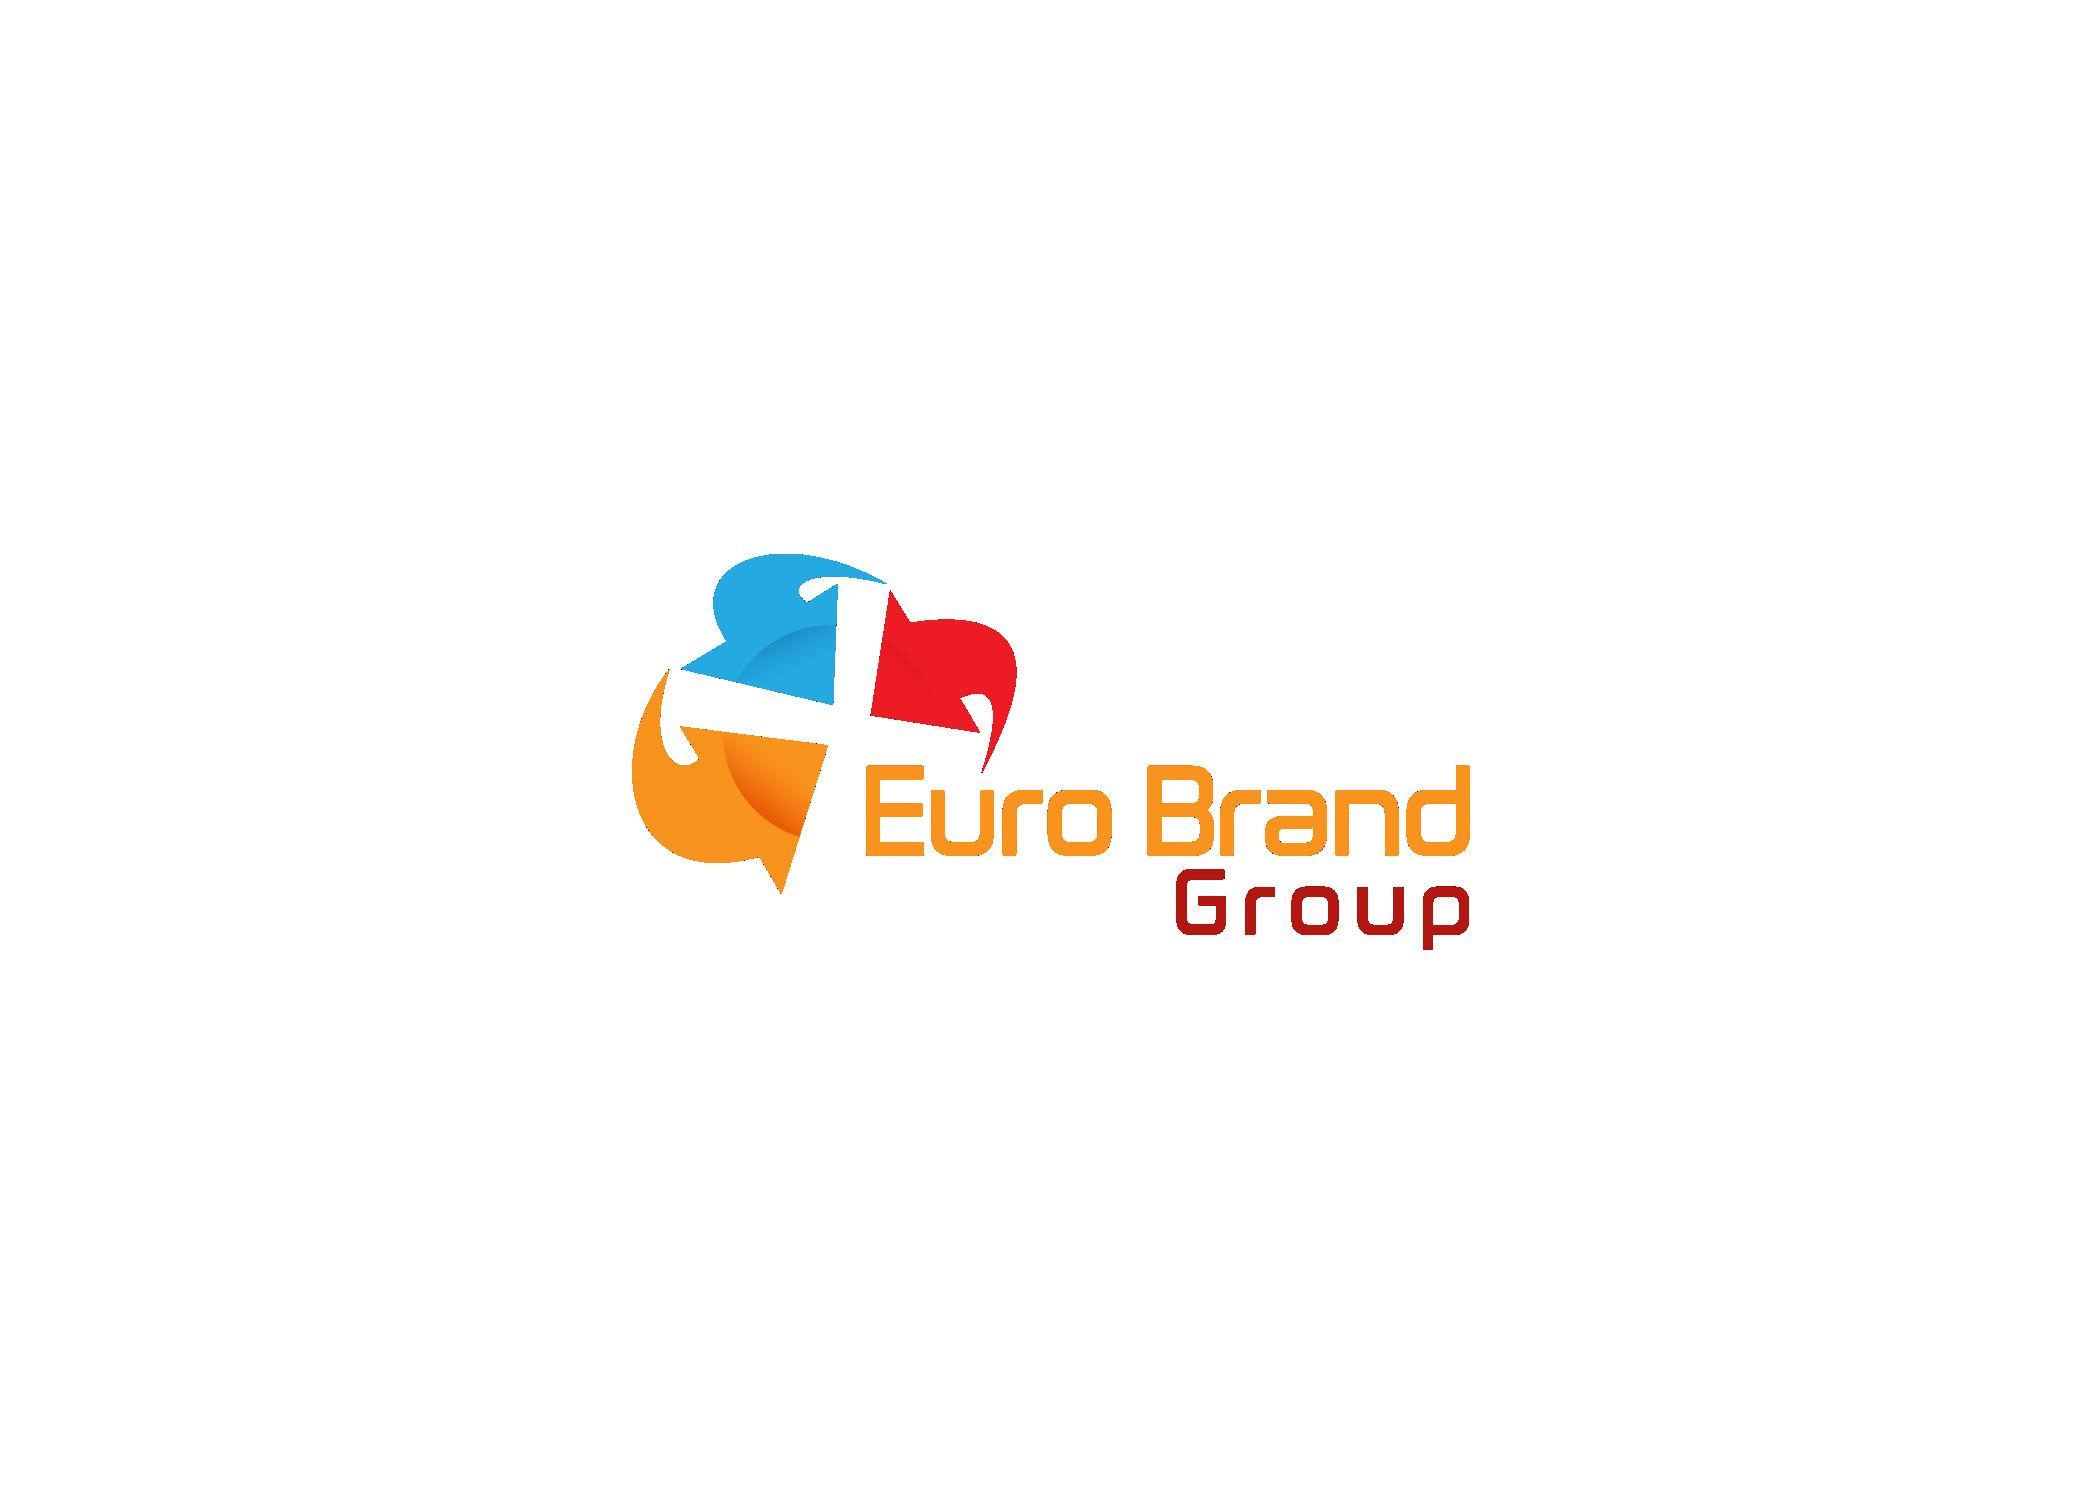 Euro brand group